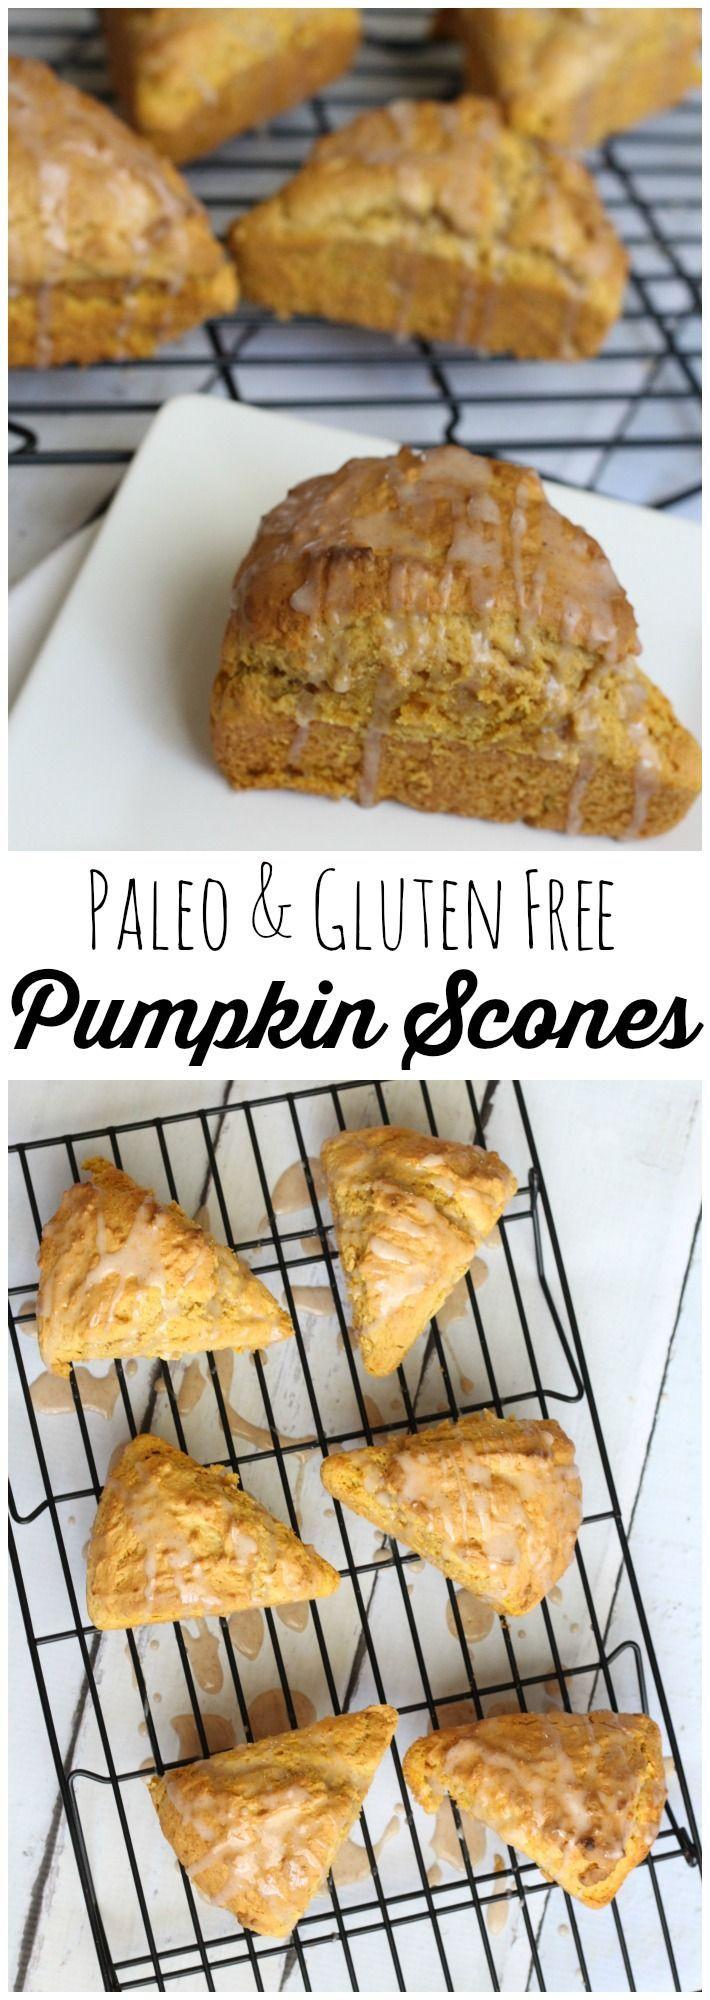 Paleo & Gluten Free Pumpkin Scones SCROLL down for correct version.